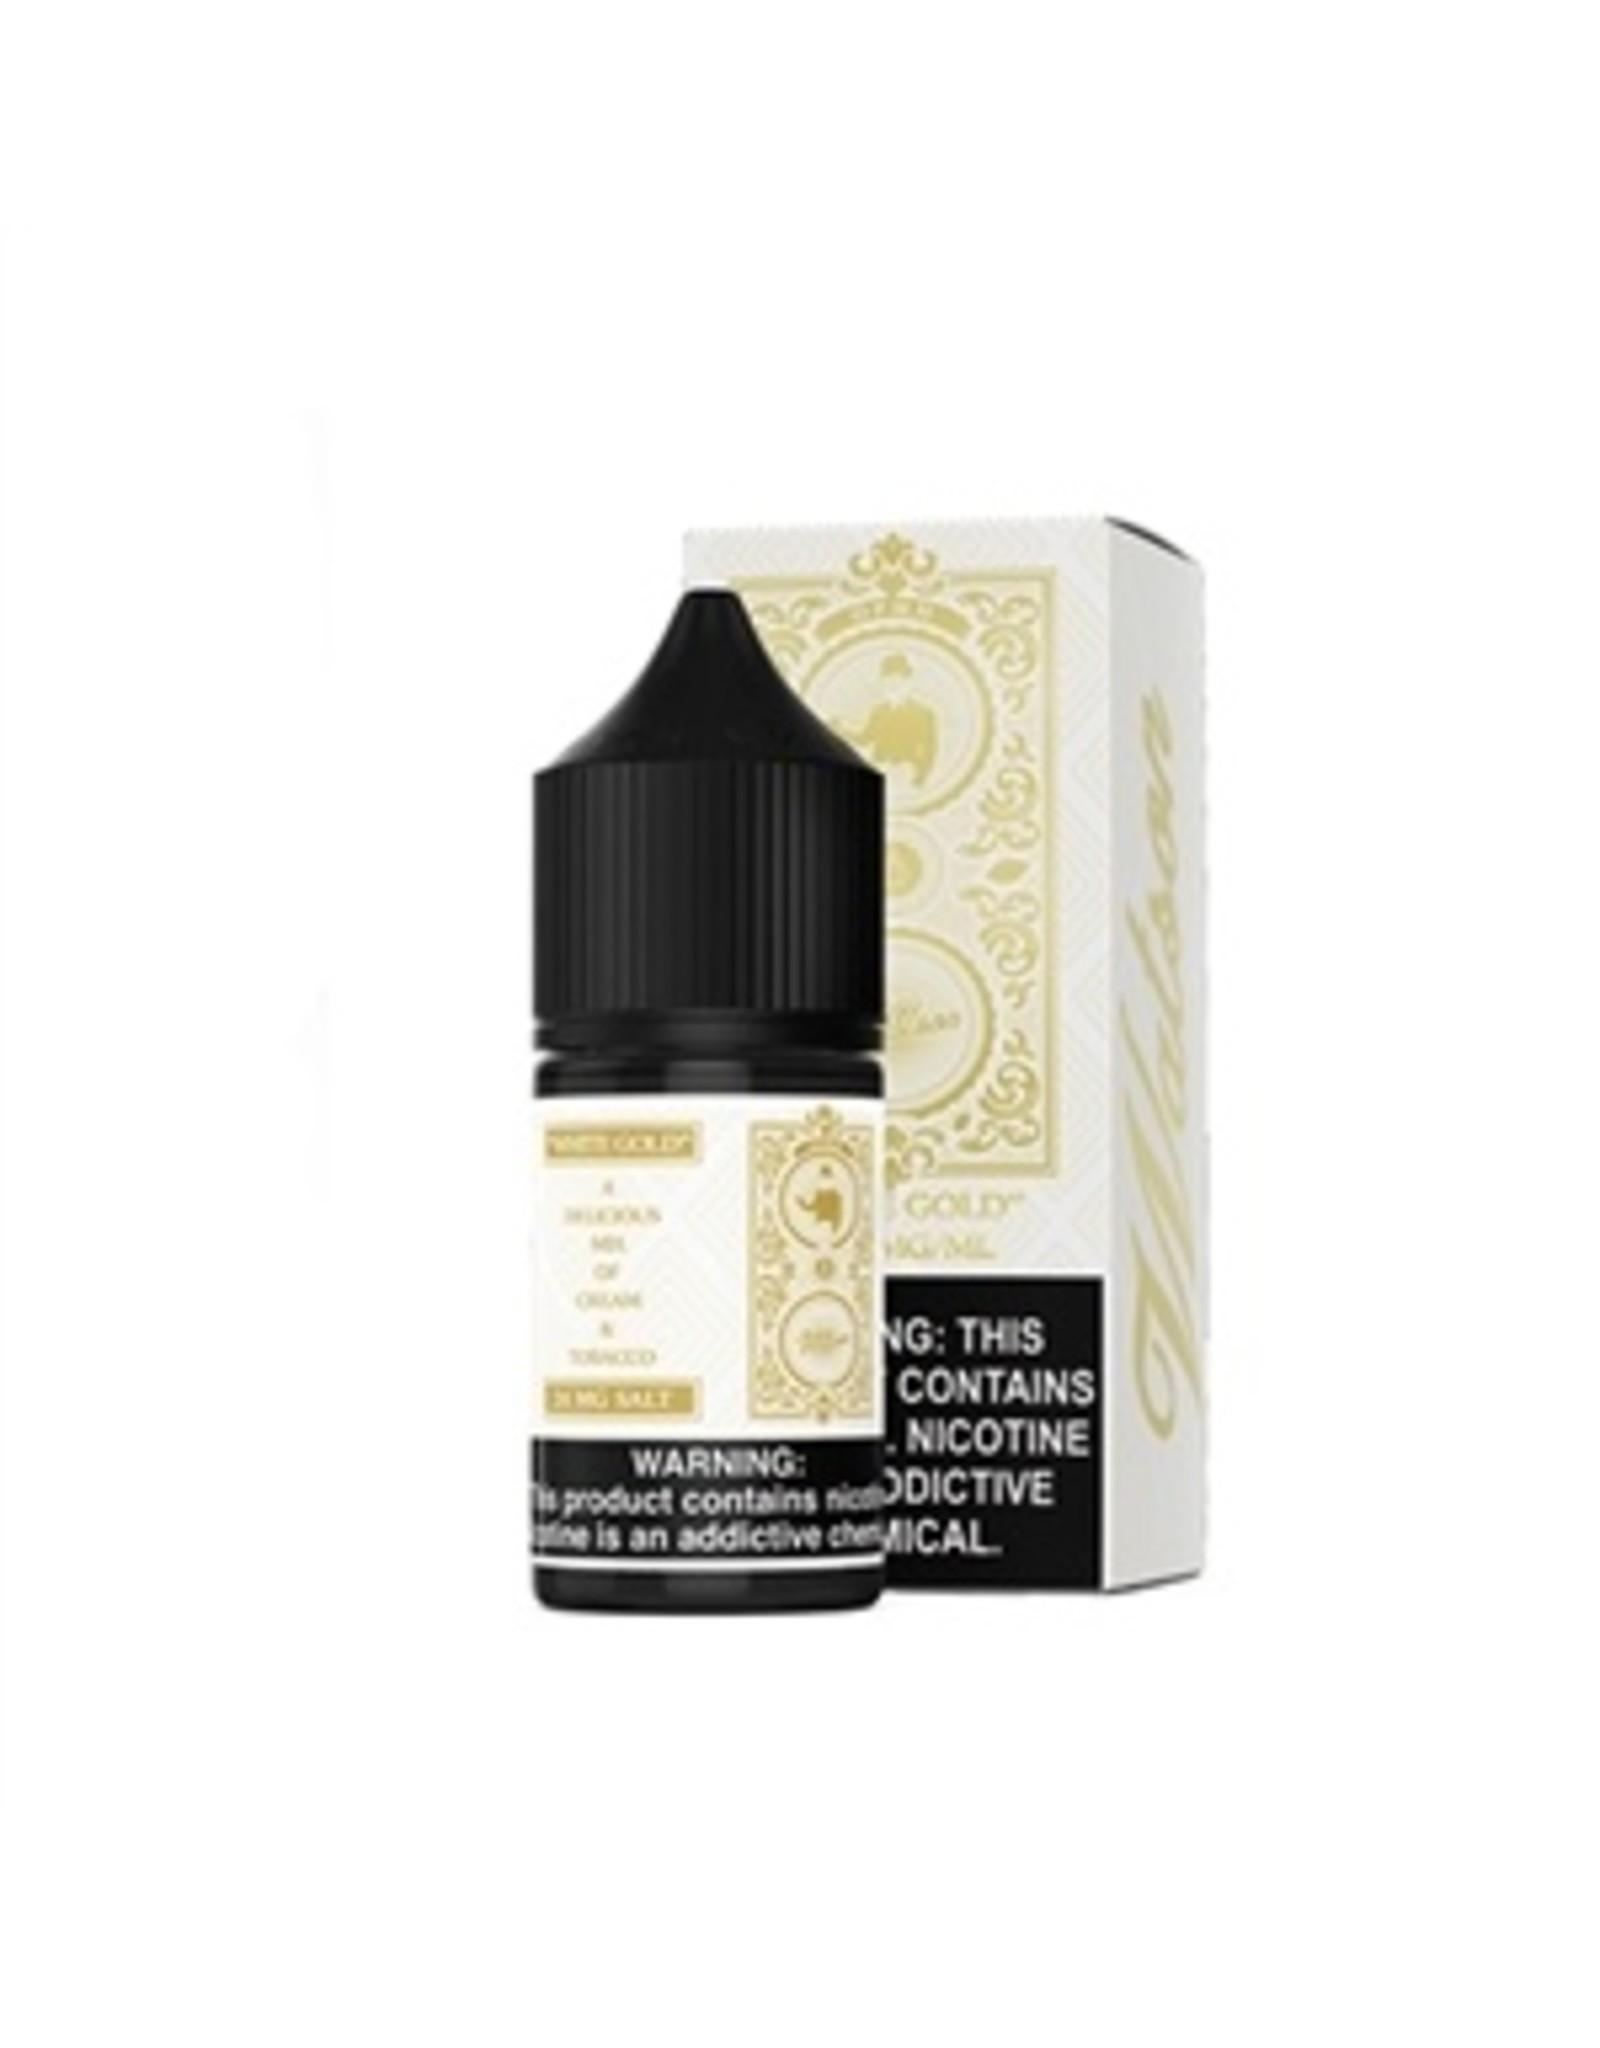 OPHM Watson White Gold Salt by OPMH